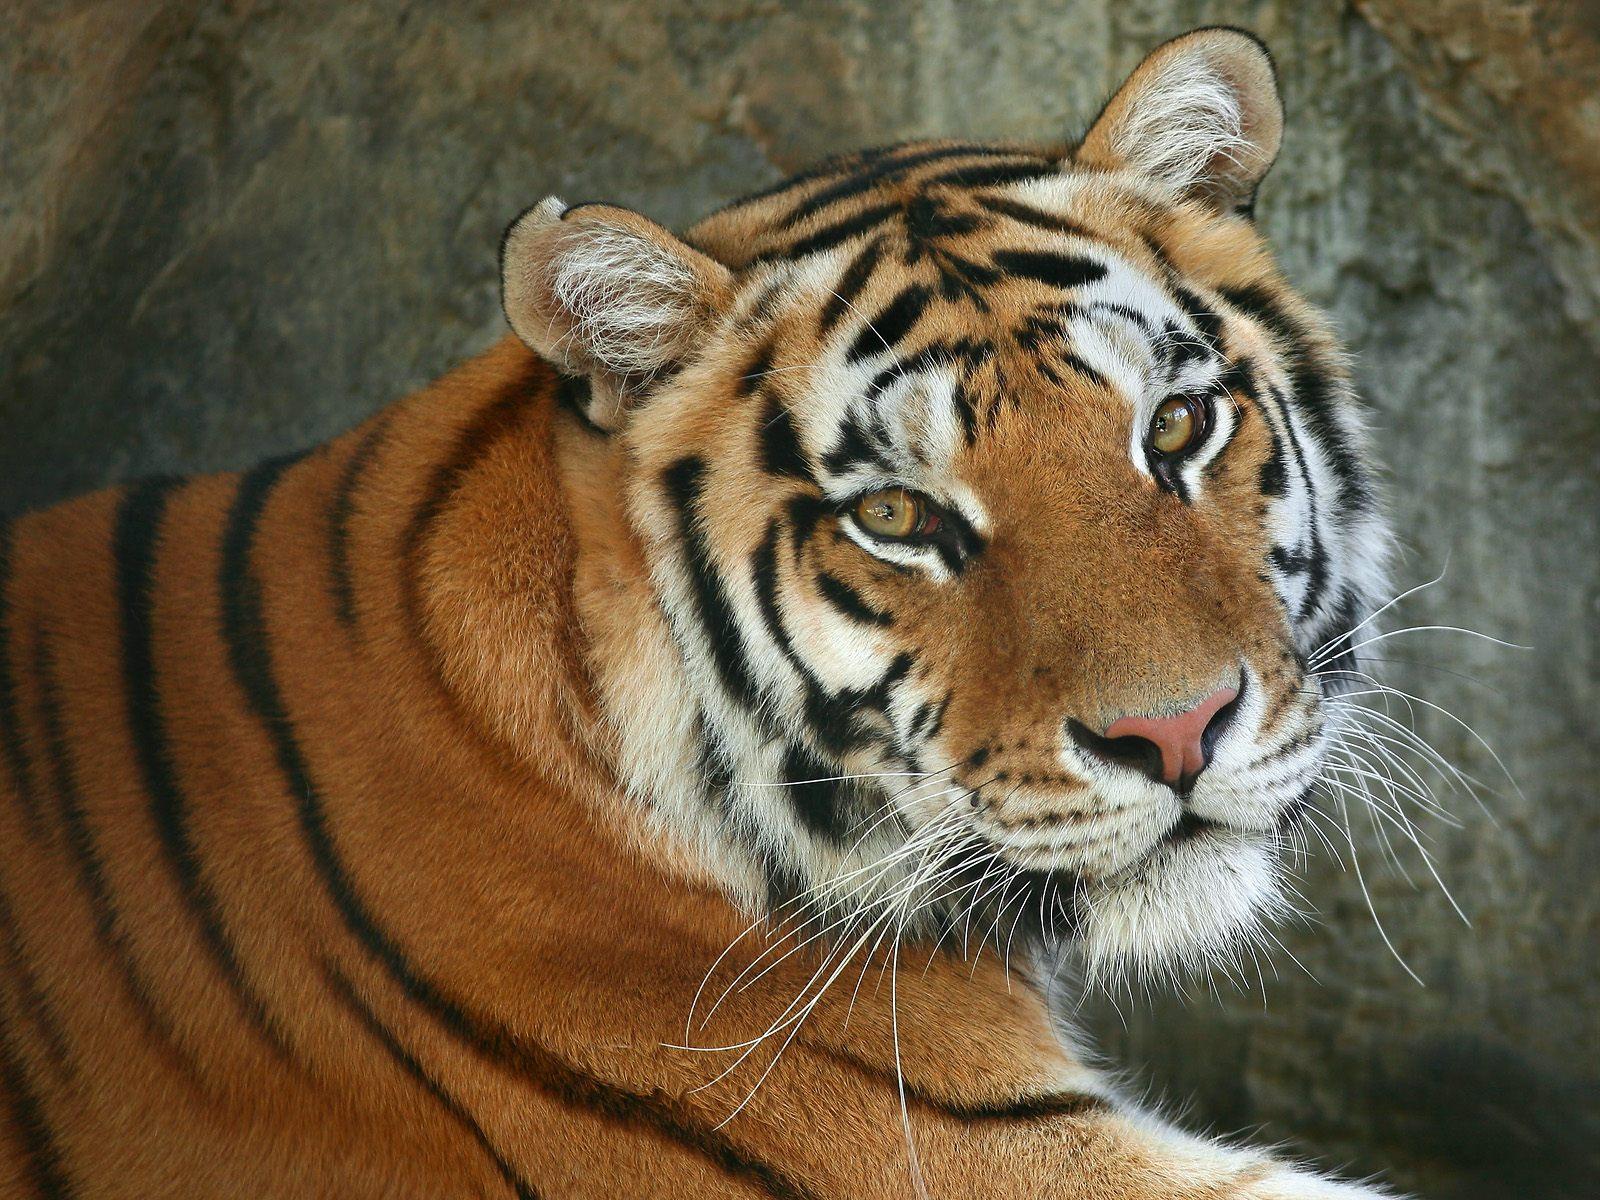 rate select rating give beautiful animal 1 5 give beautiful animal 2 1600x1200